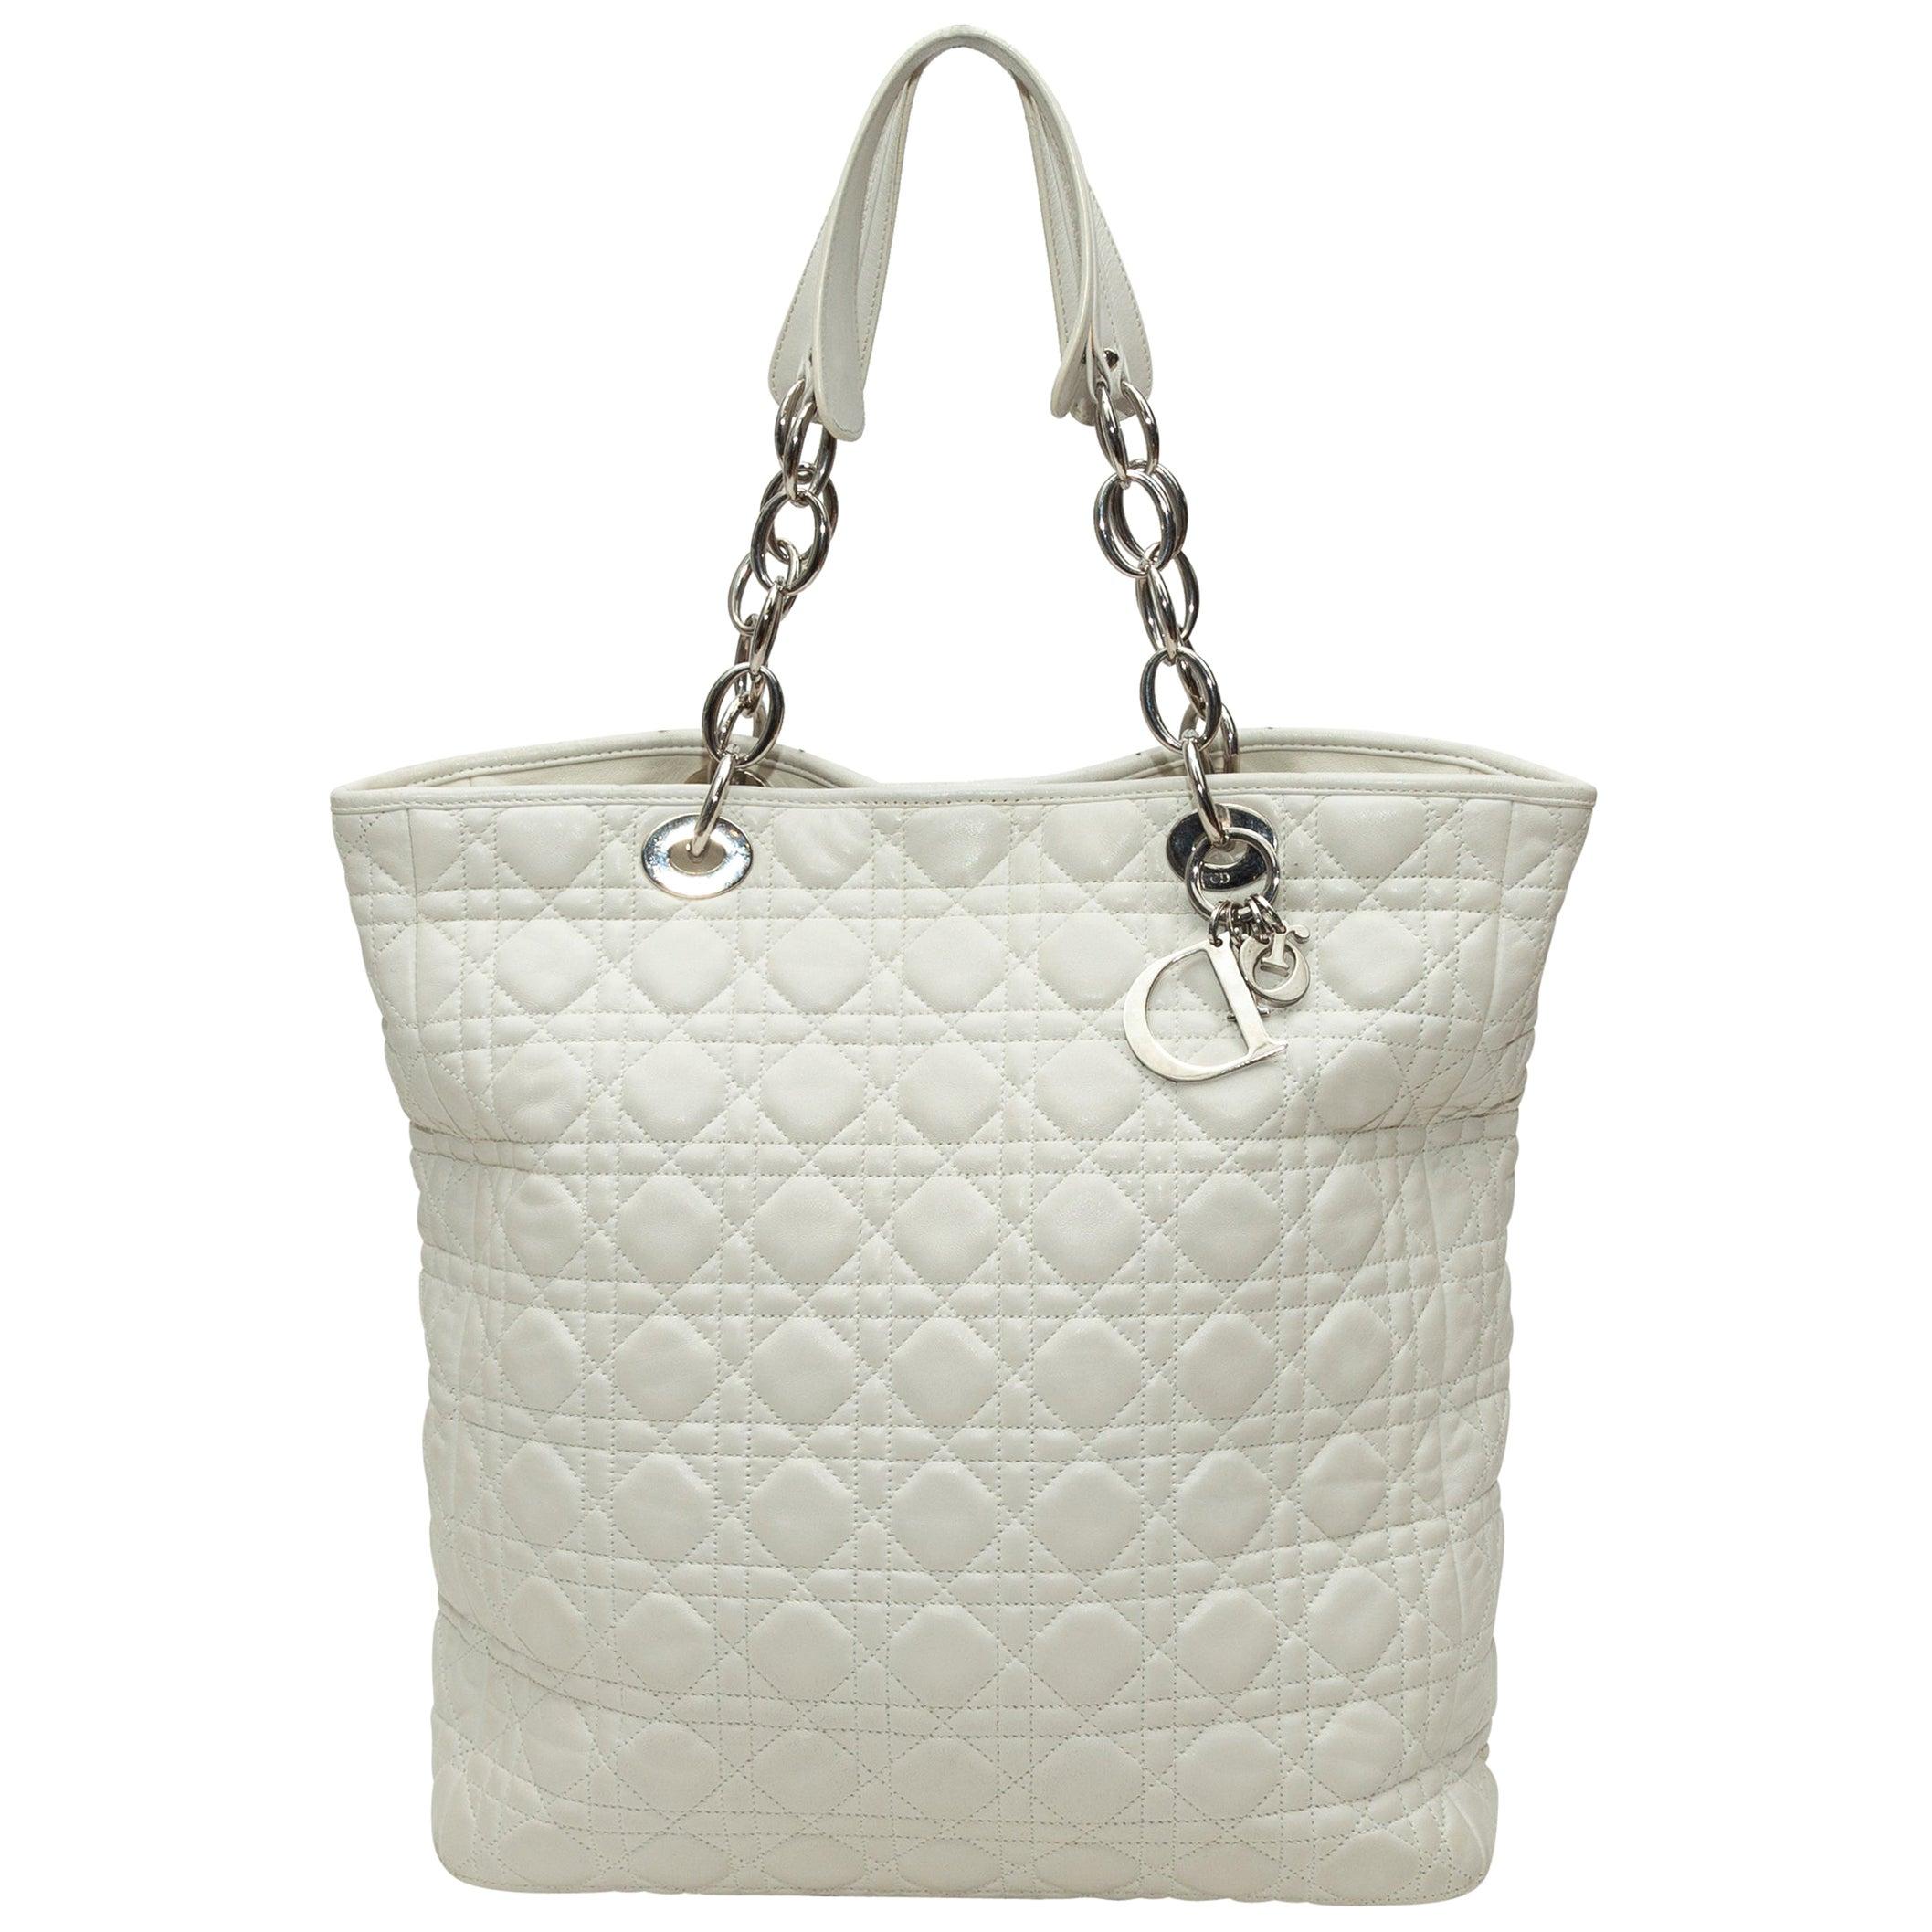 Christian Dior White Cannage Soft Shopper Tote